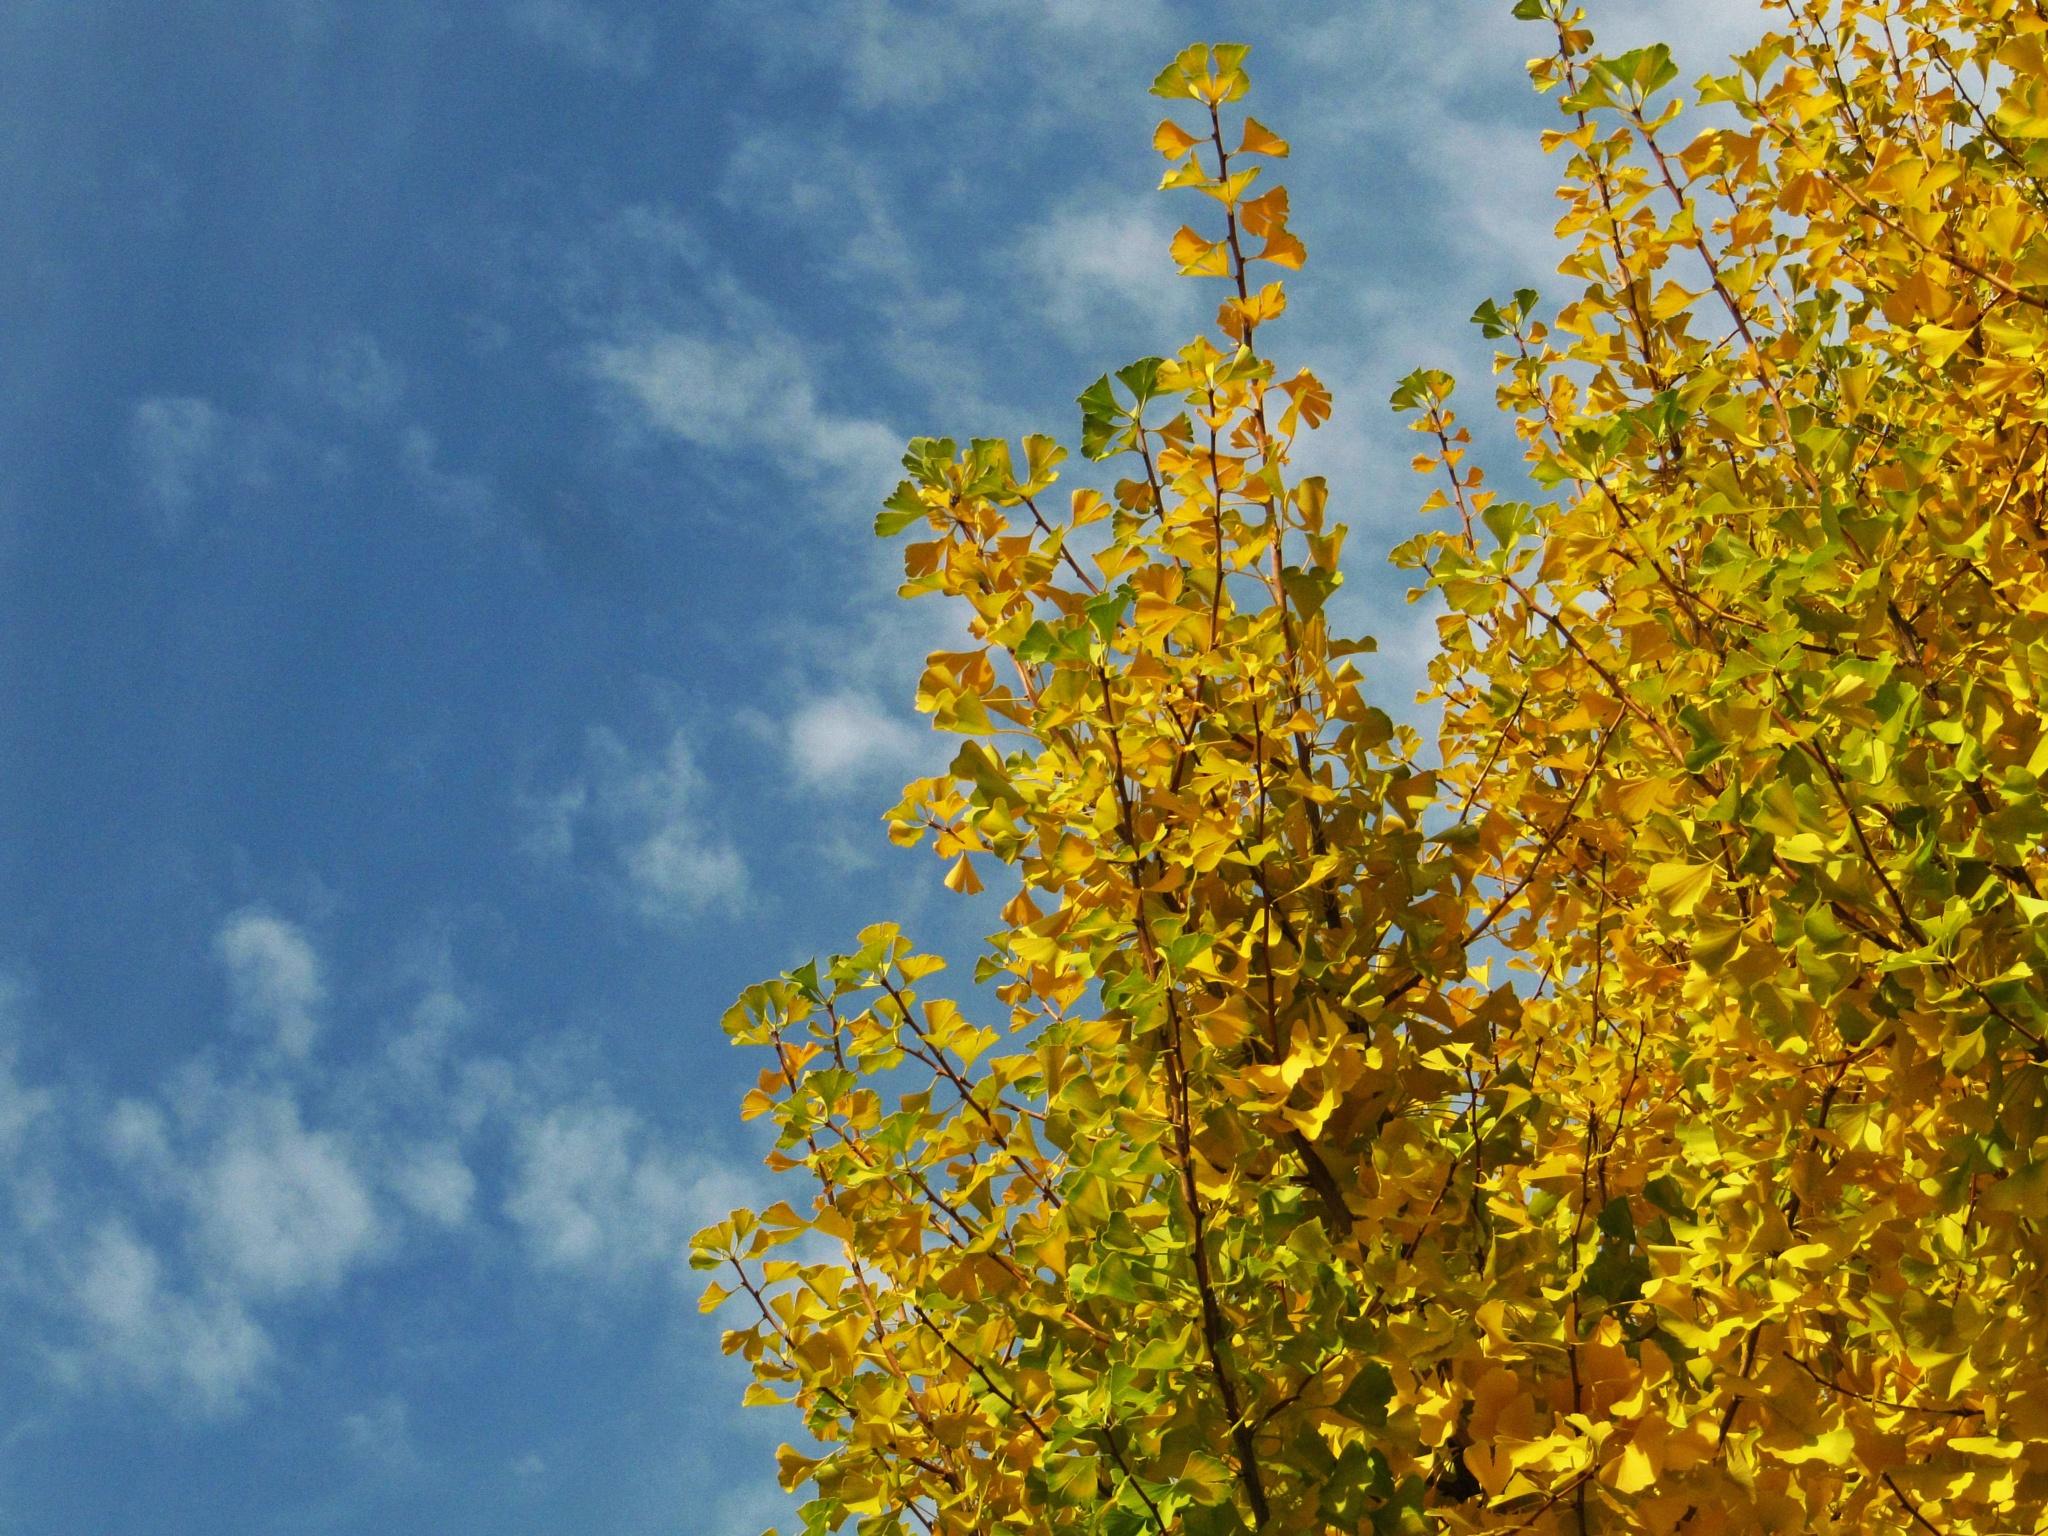 The ginkgo in autumn sky by SANRI